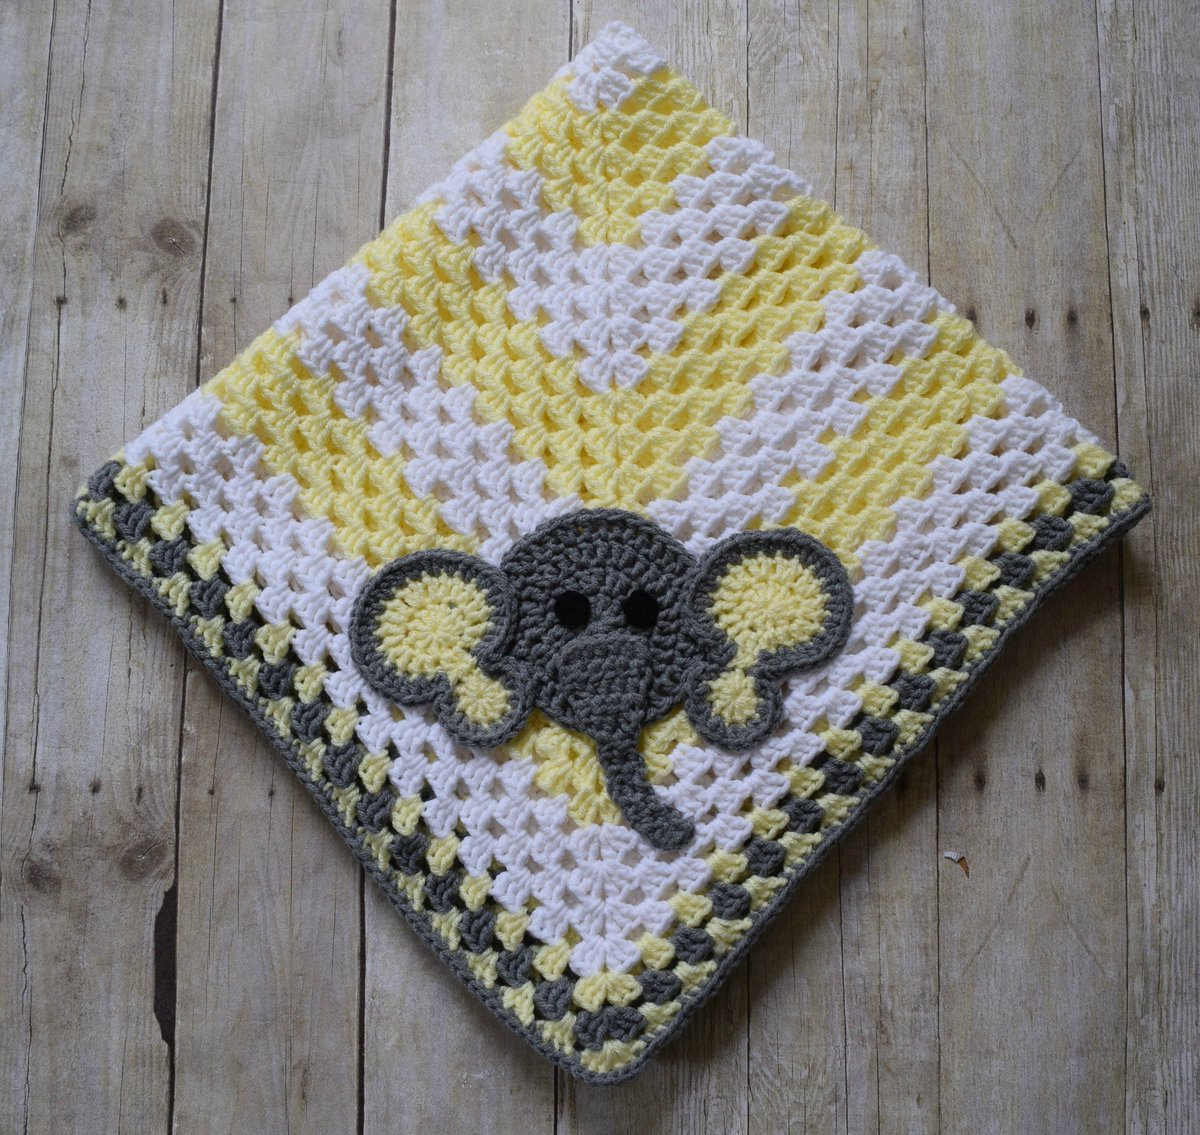 Sitting Elephant Blue and White Baby Blanket / Crochet Baby | Etsy | 1135x1200